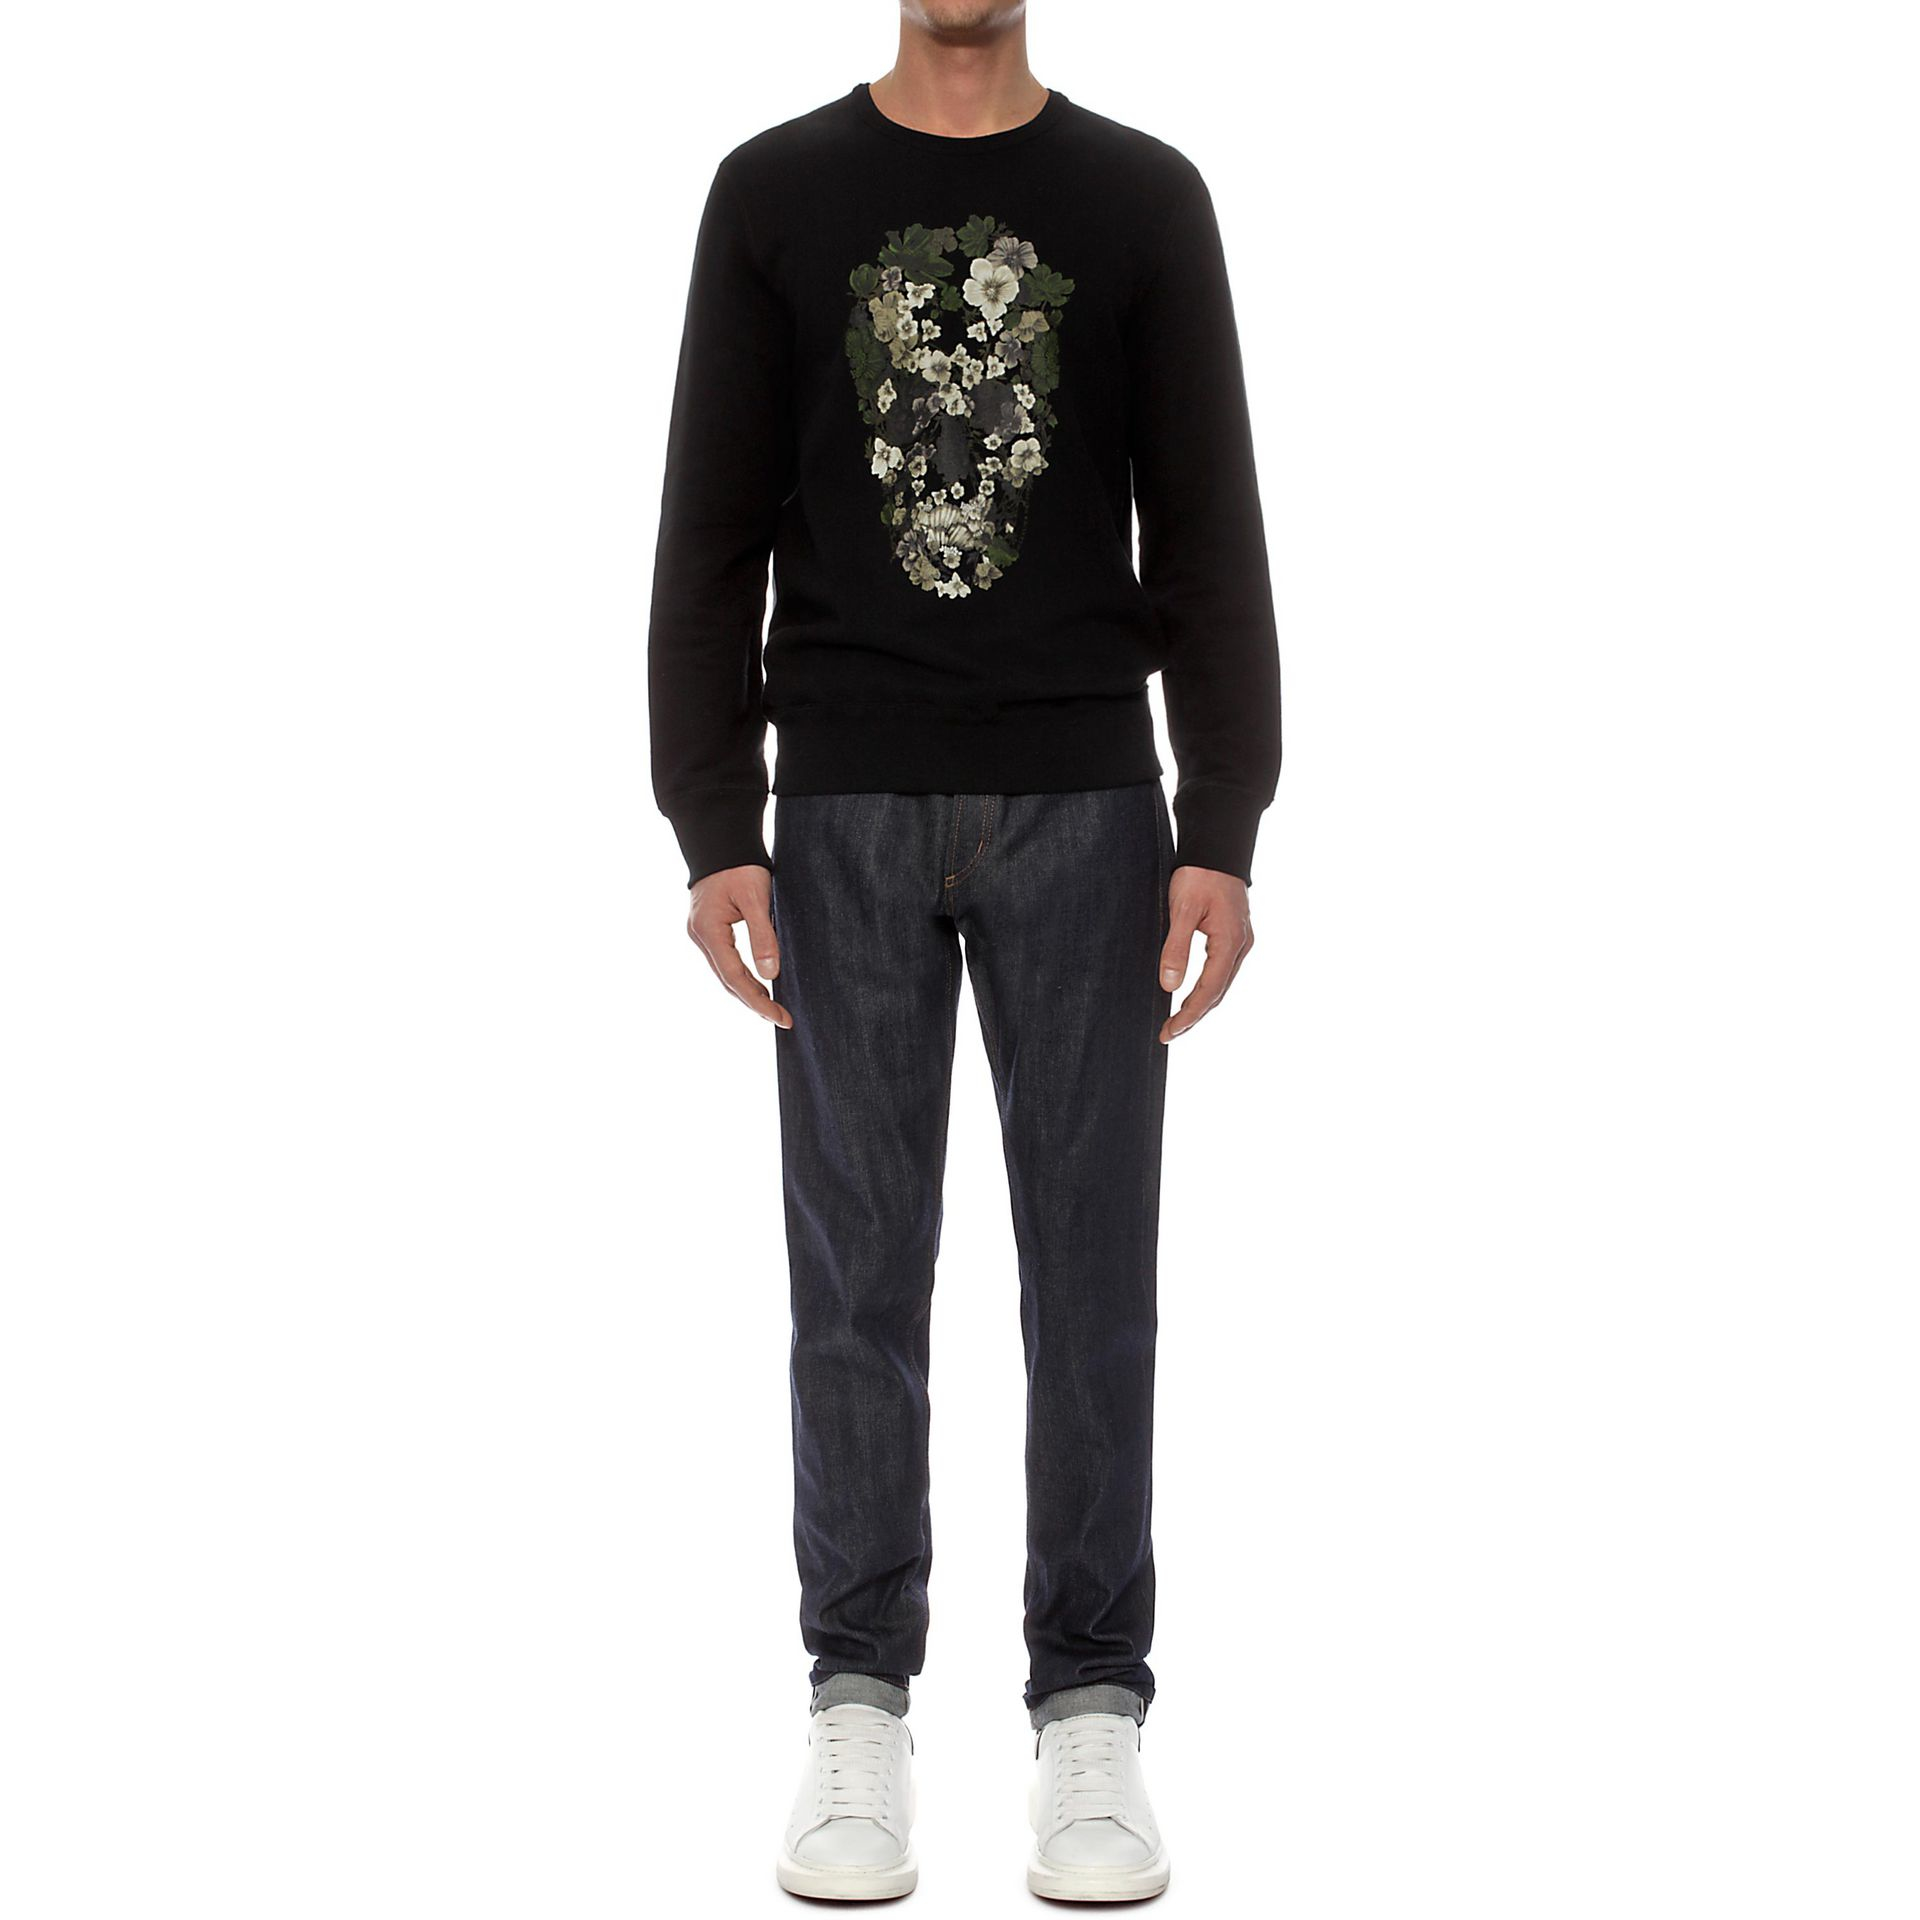 lyst alexander mcqueen flower skull print sweatshirt in black for men. Black Bedroom Furniture Sets. Home Design Ideas